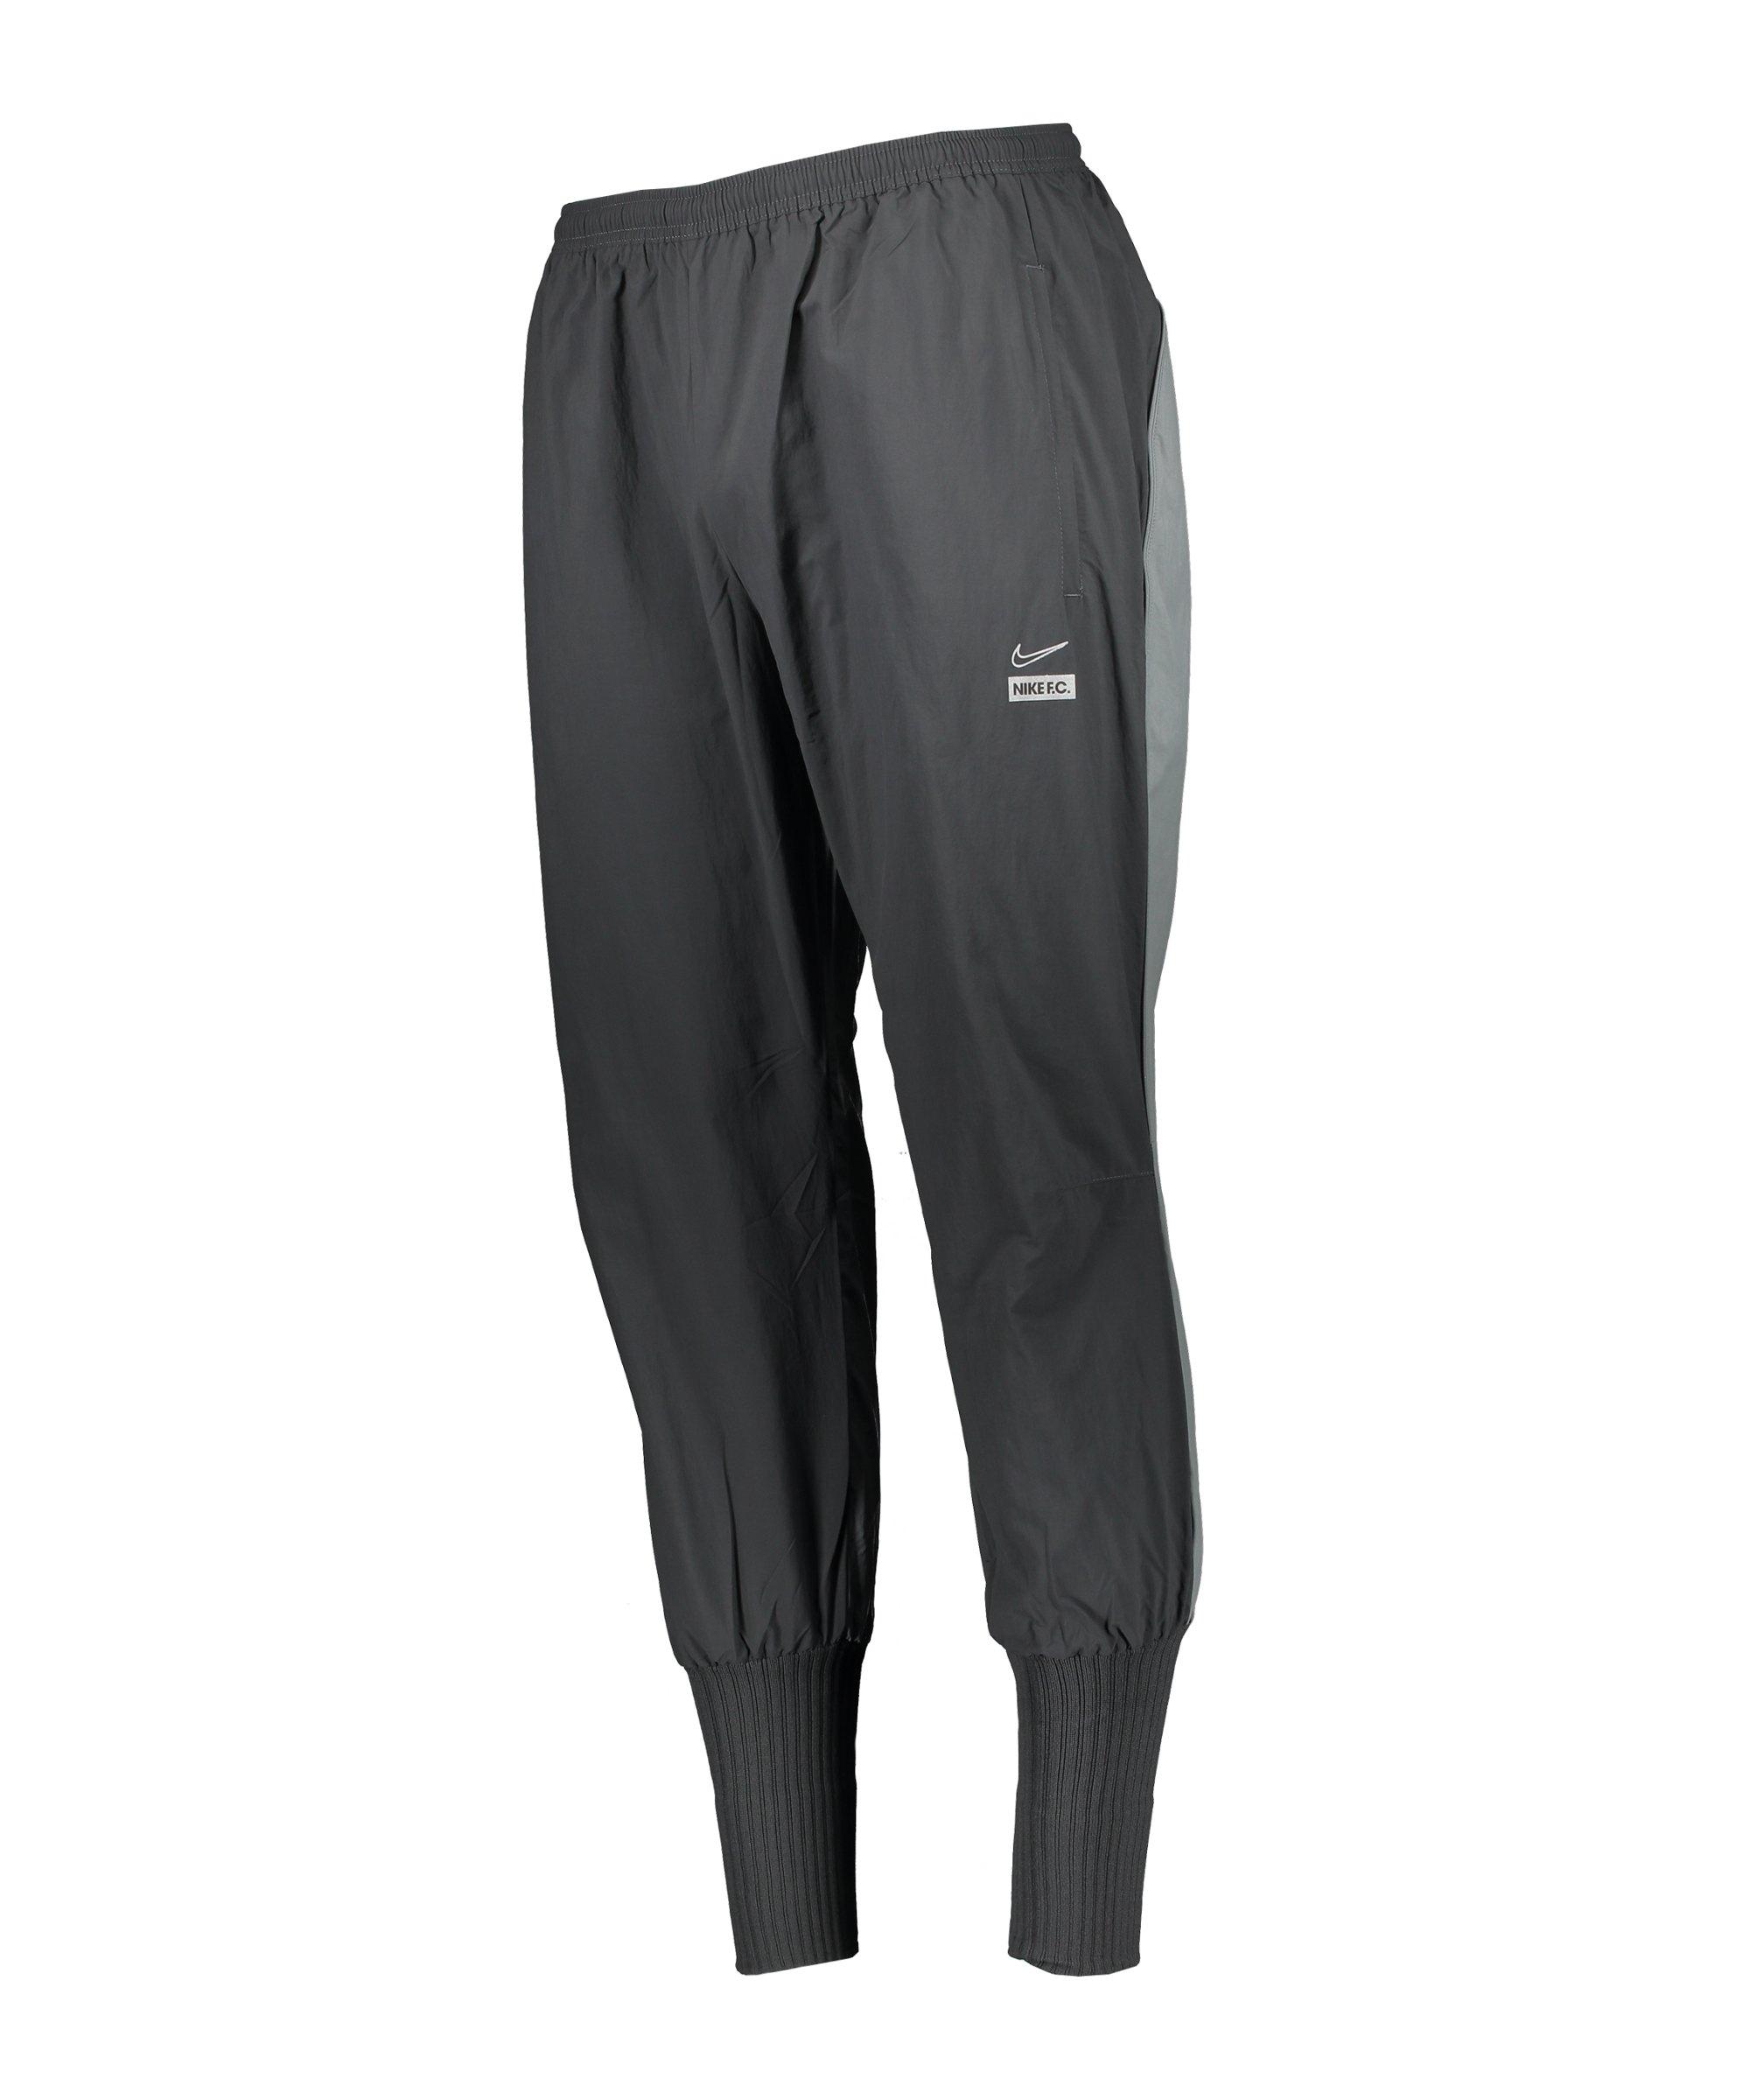 Nike F.C. Woven Cuffed Jogginghose Grau F070 - grau